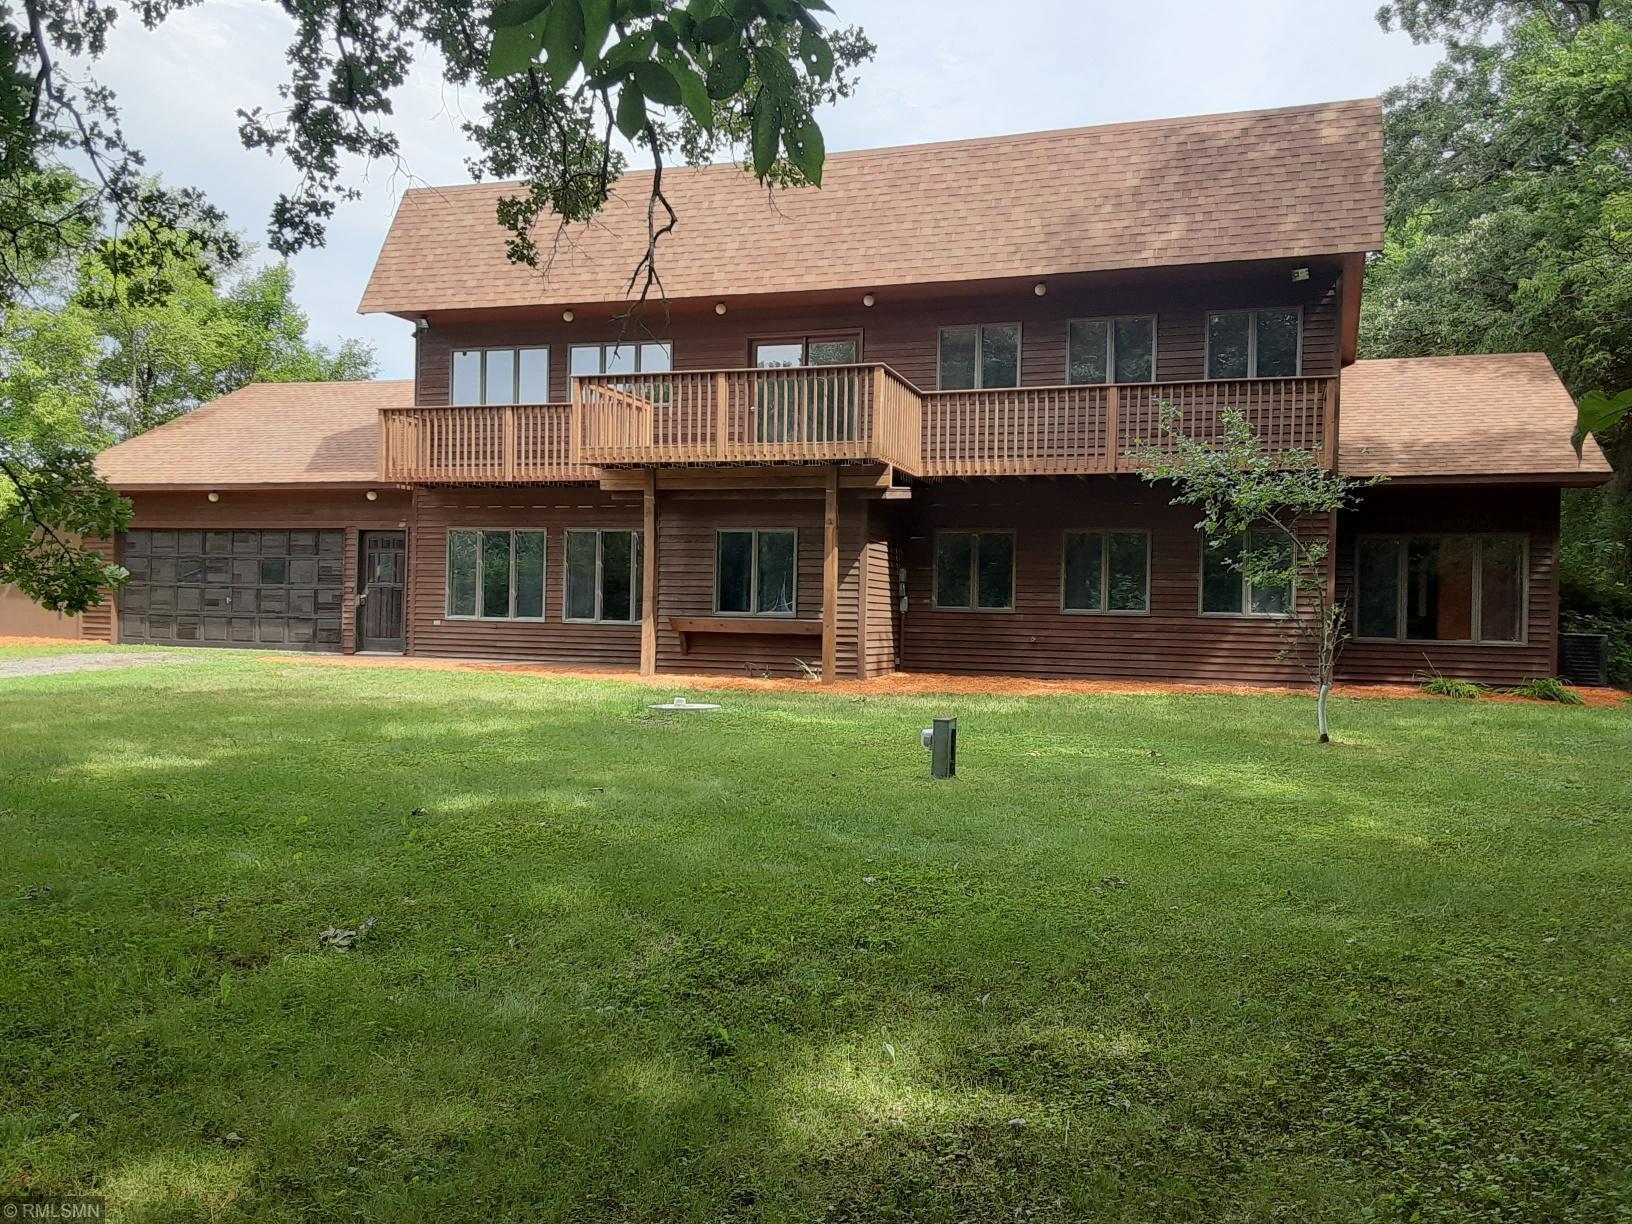 5701 Bradley Property Photo - South Haven, MN real estate listing